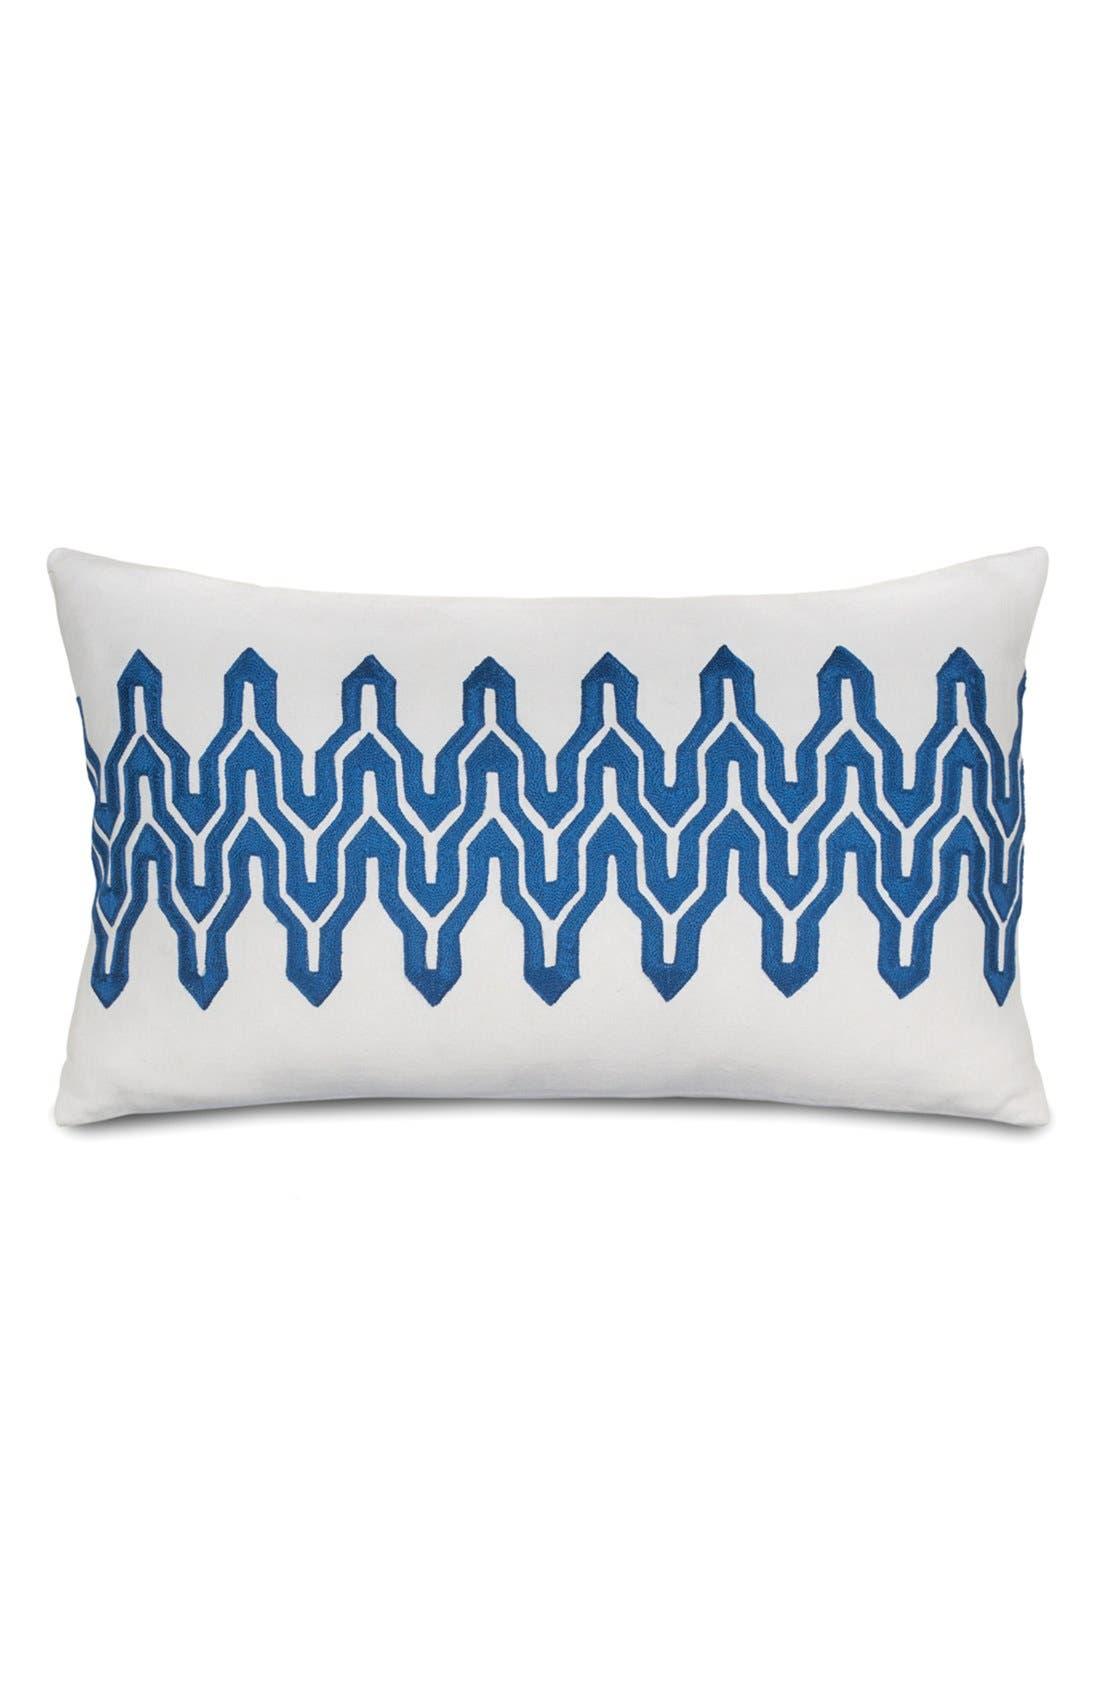 Alternate Image 1 Selected - Jill Rosenwald 'Plimpton Flame' Pillow